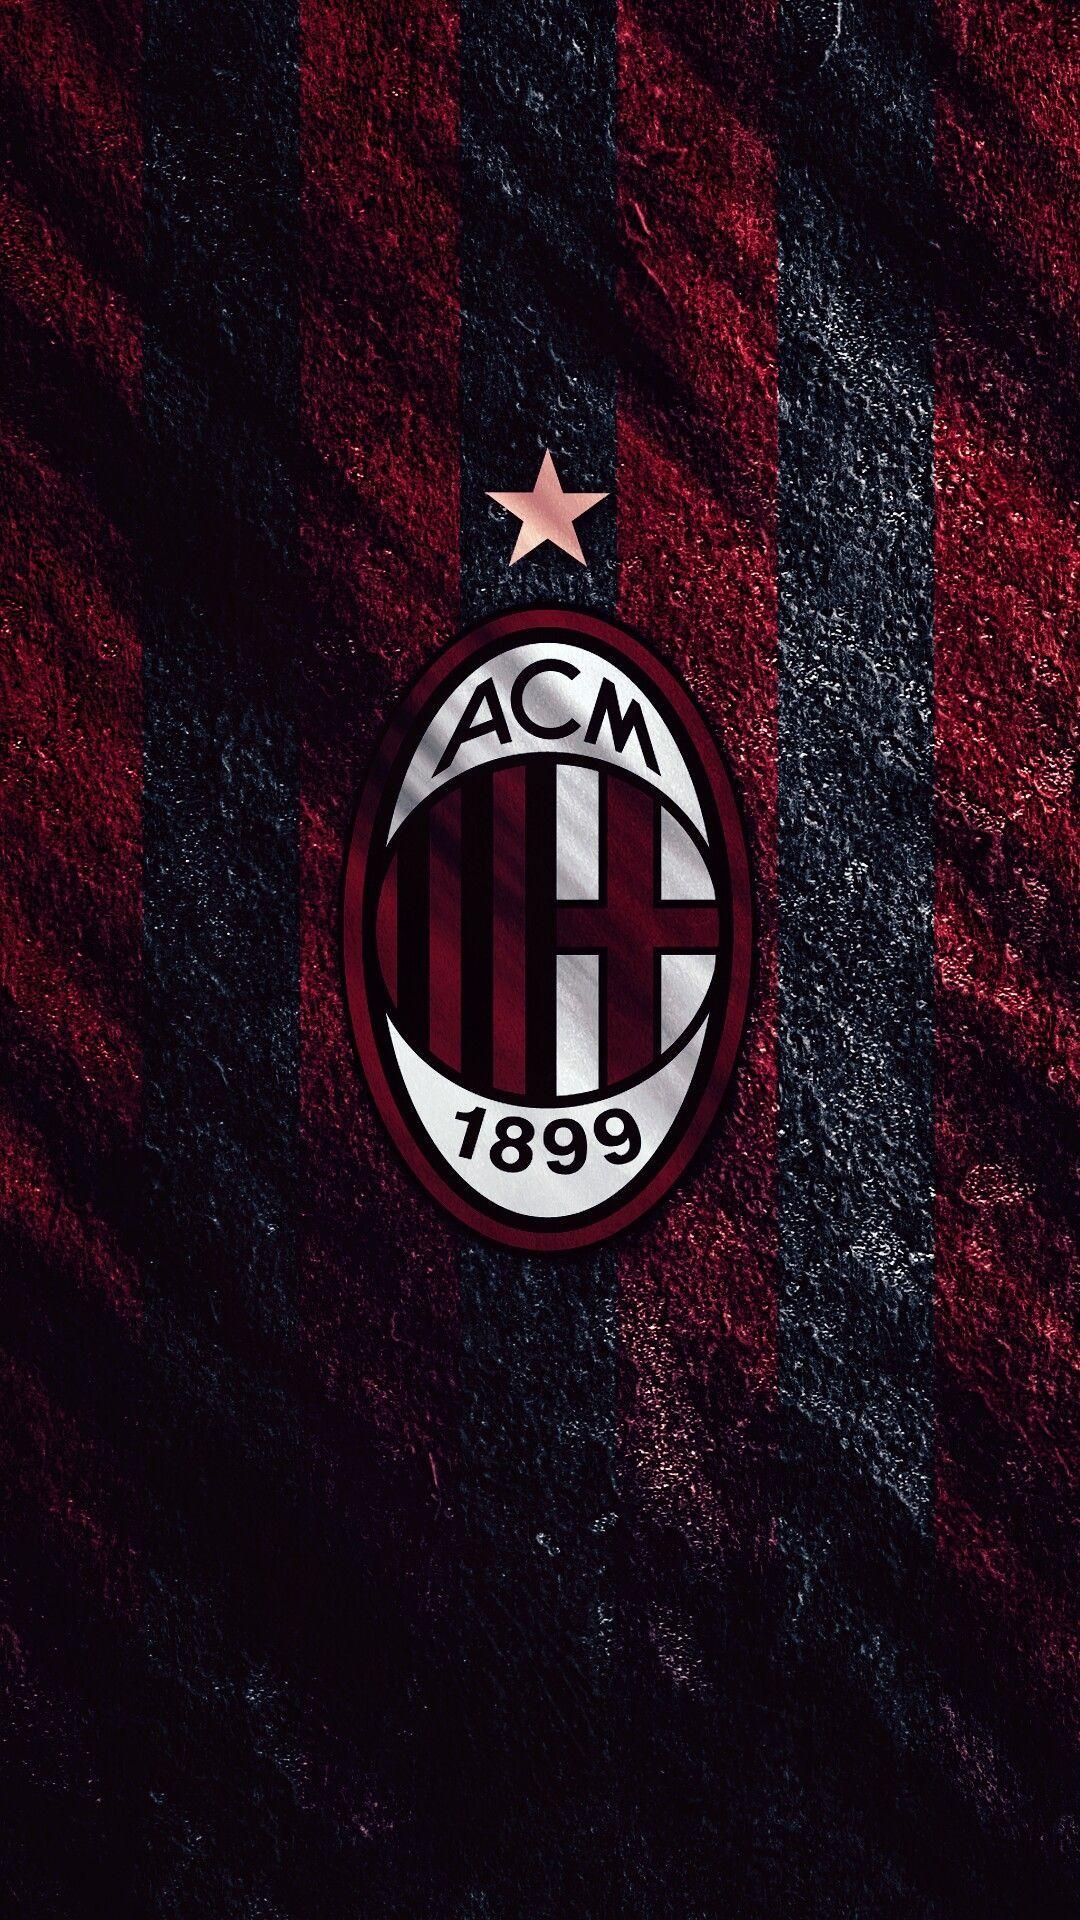 ac milan wallpaper acmilan acm wallpaper wallpapers forzamilan acmilan1899 weareacmilan rossoneri soccer foot bola kaki gambar sepak bola sepak bola ac milan wallpaper acmilan acm